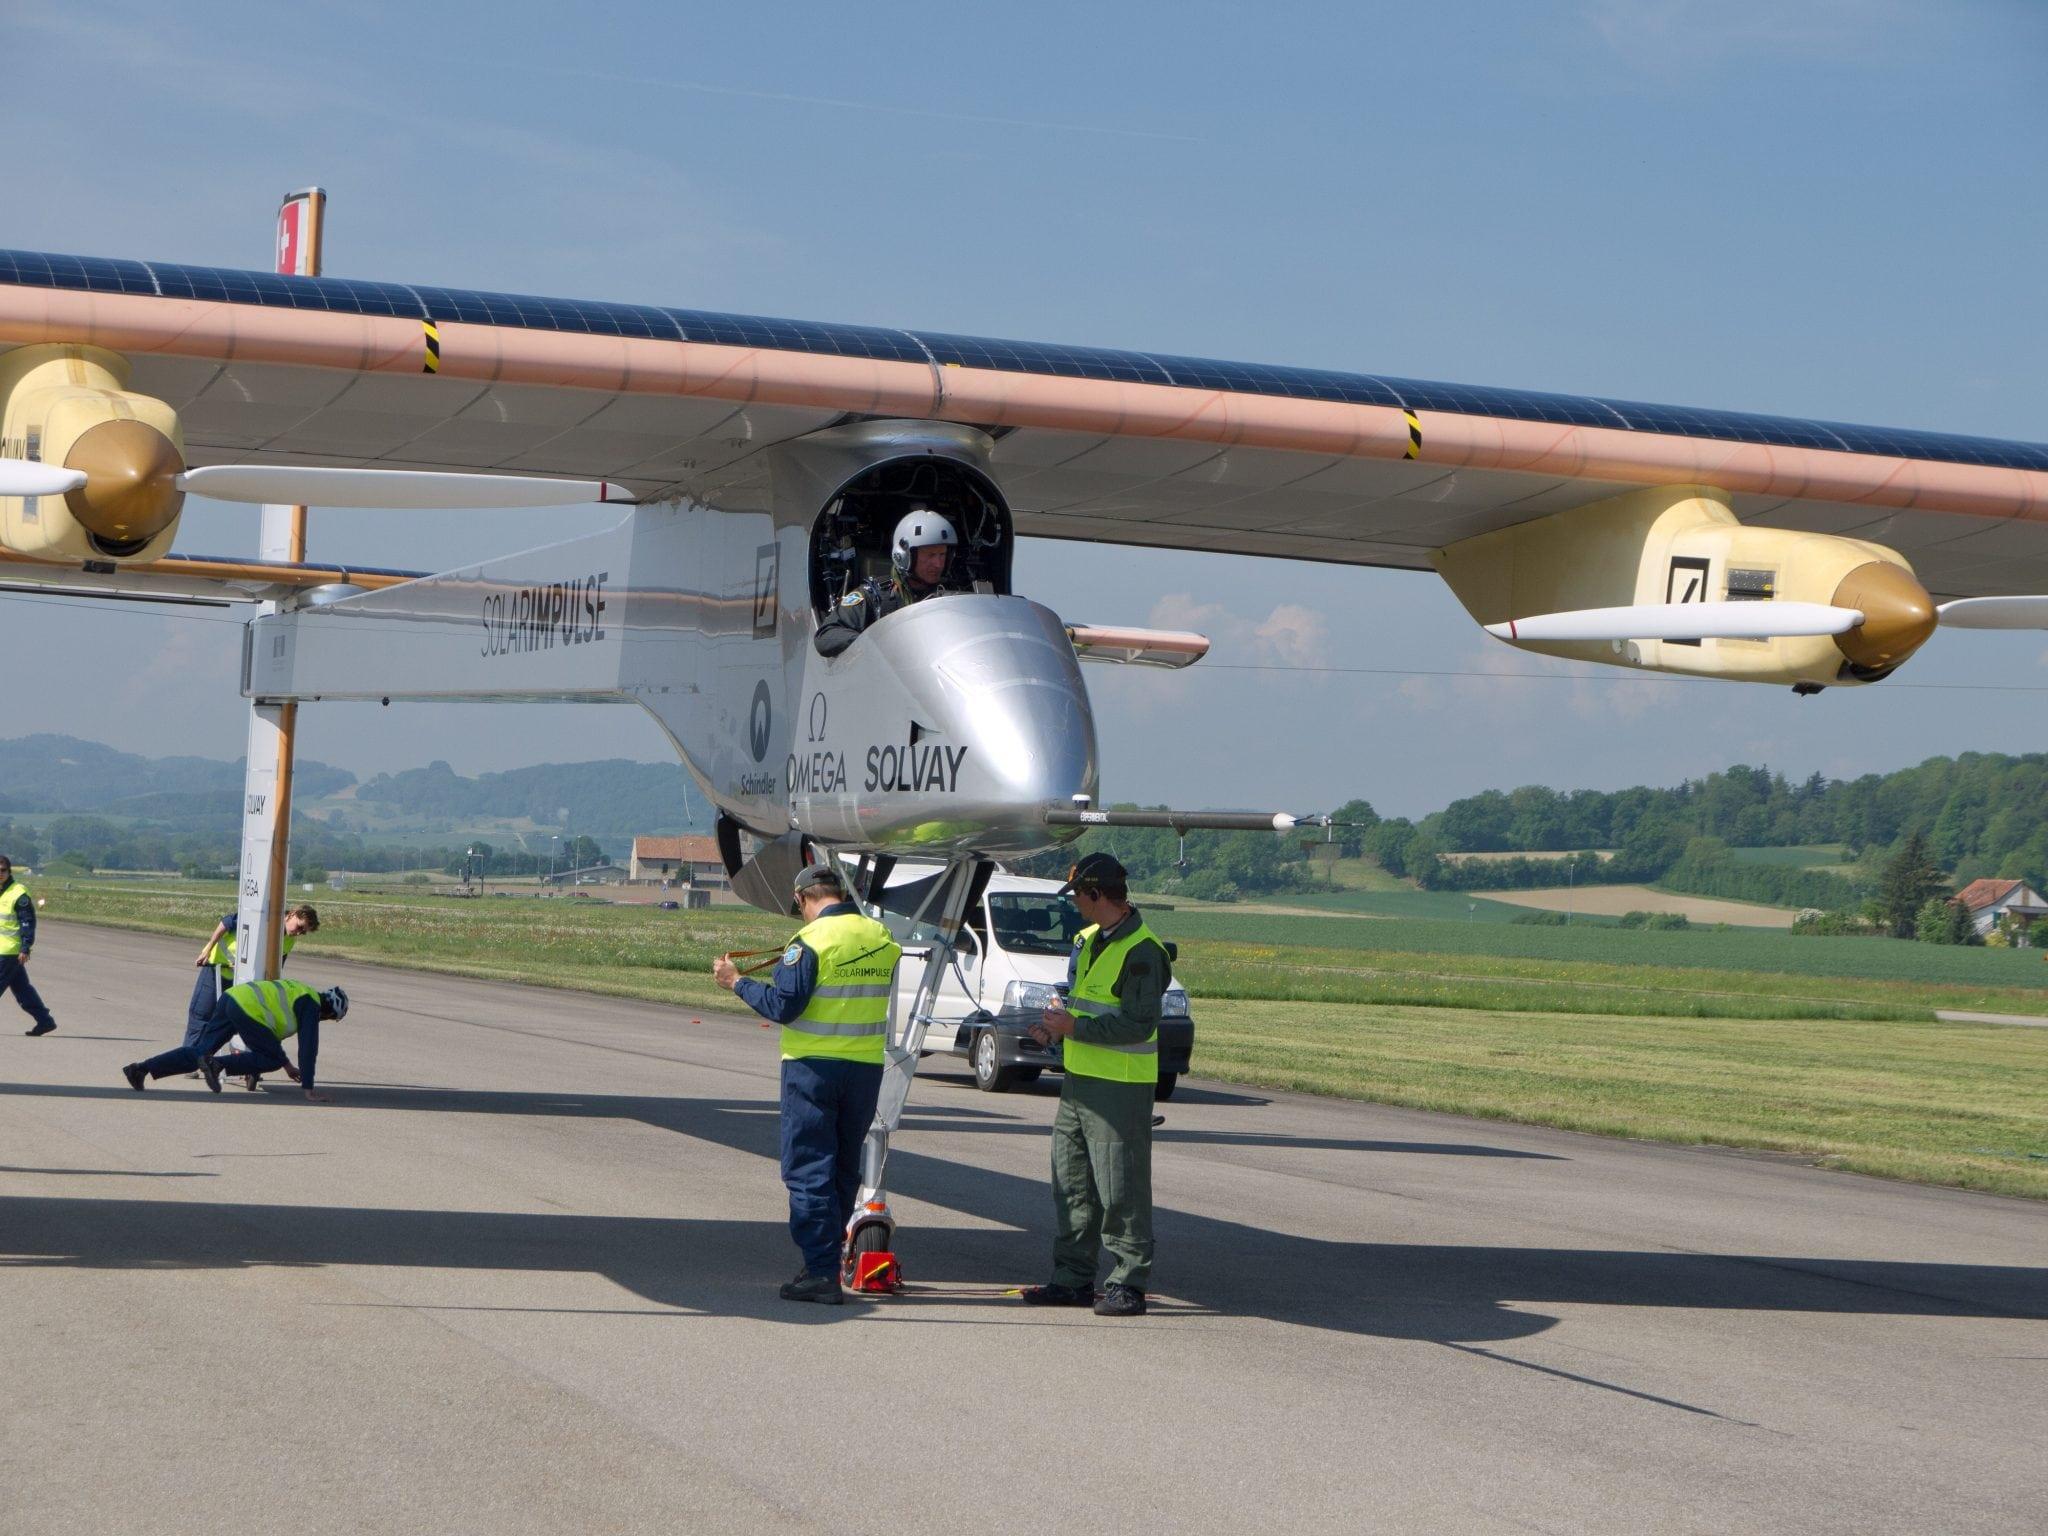 The solar Impulse prototype aircraft on runway